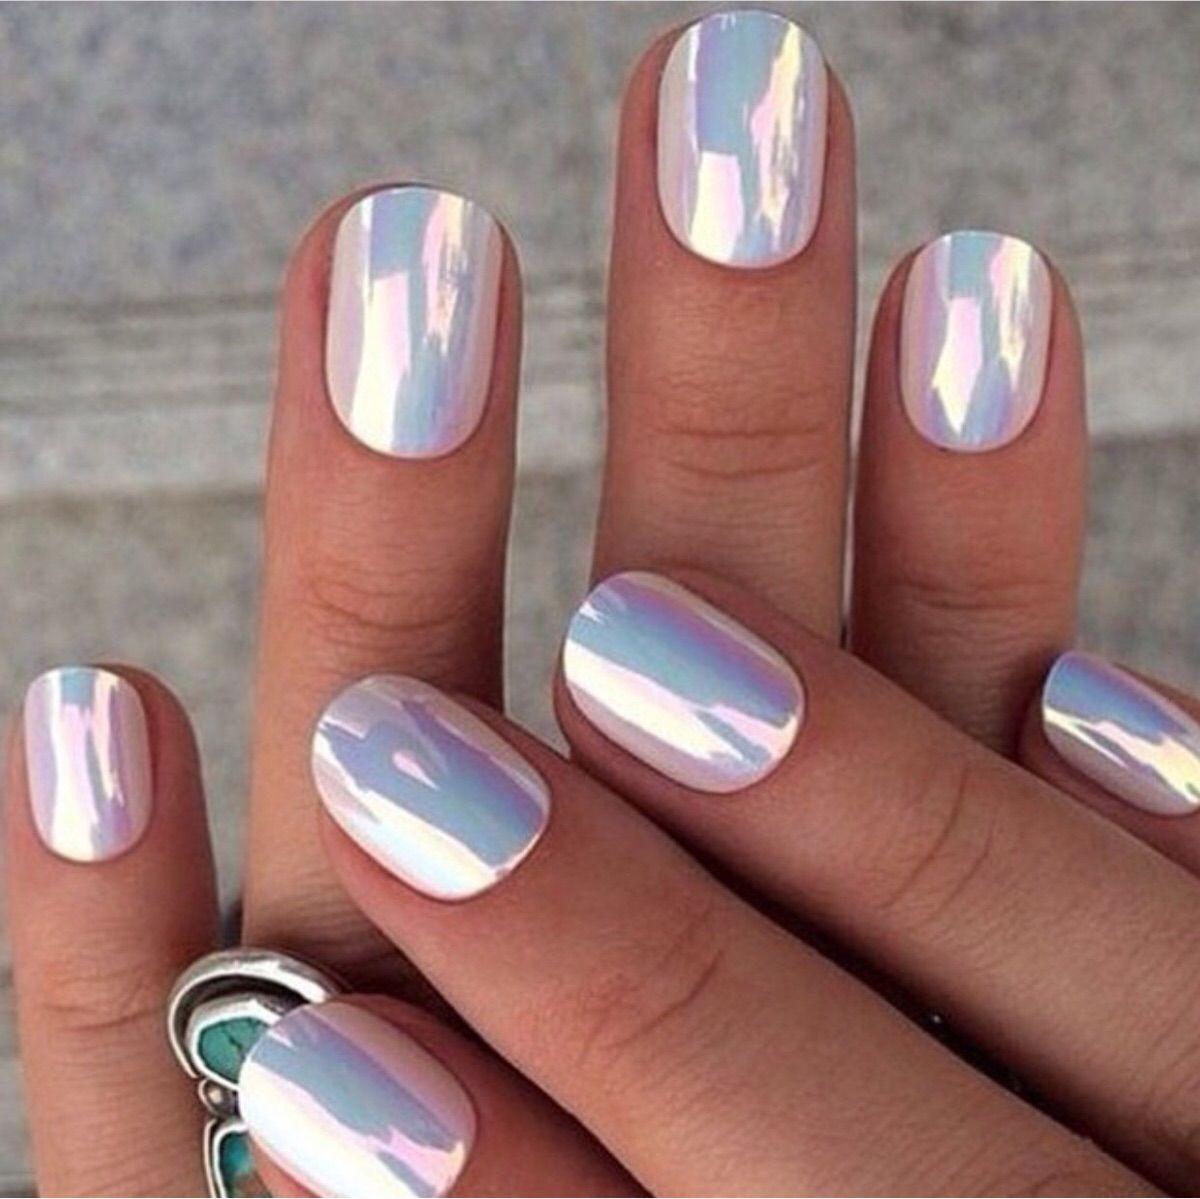 Pastel pink metallic nails   Nails   Pinterest   Diseños de uñas